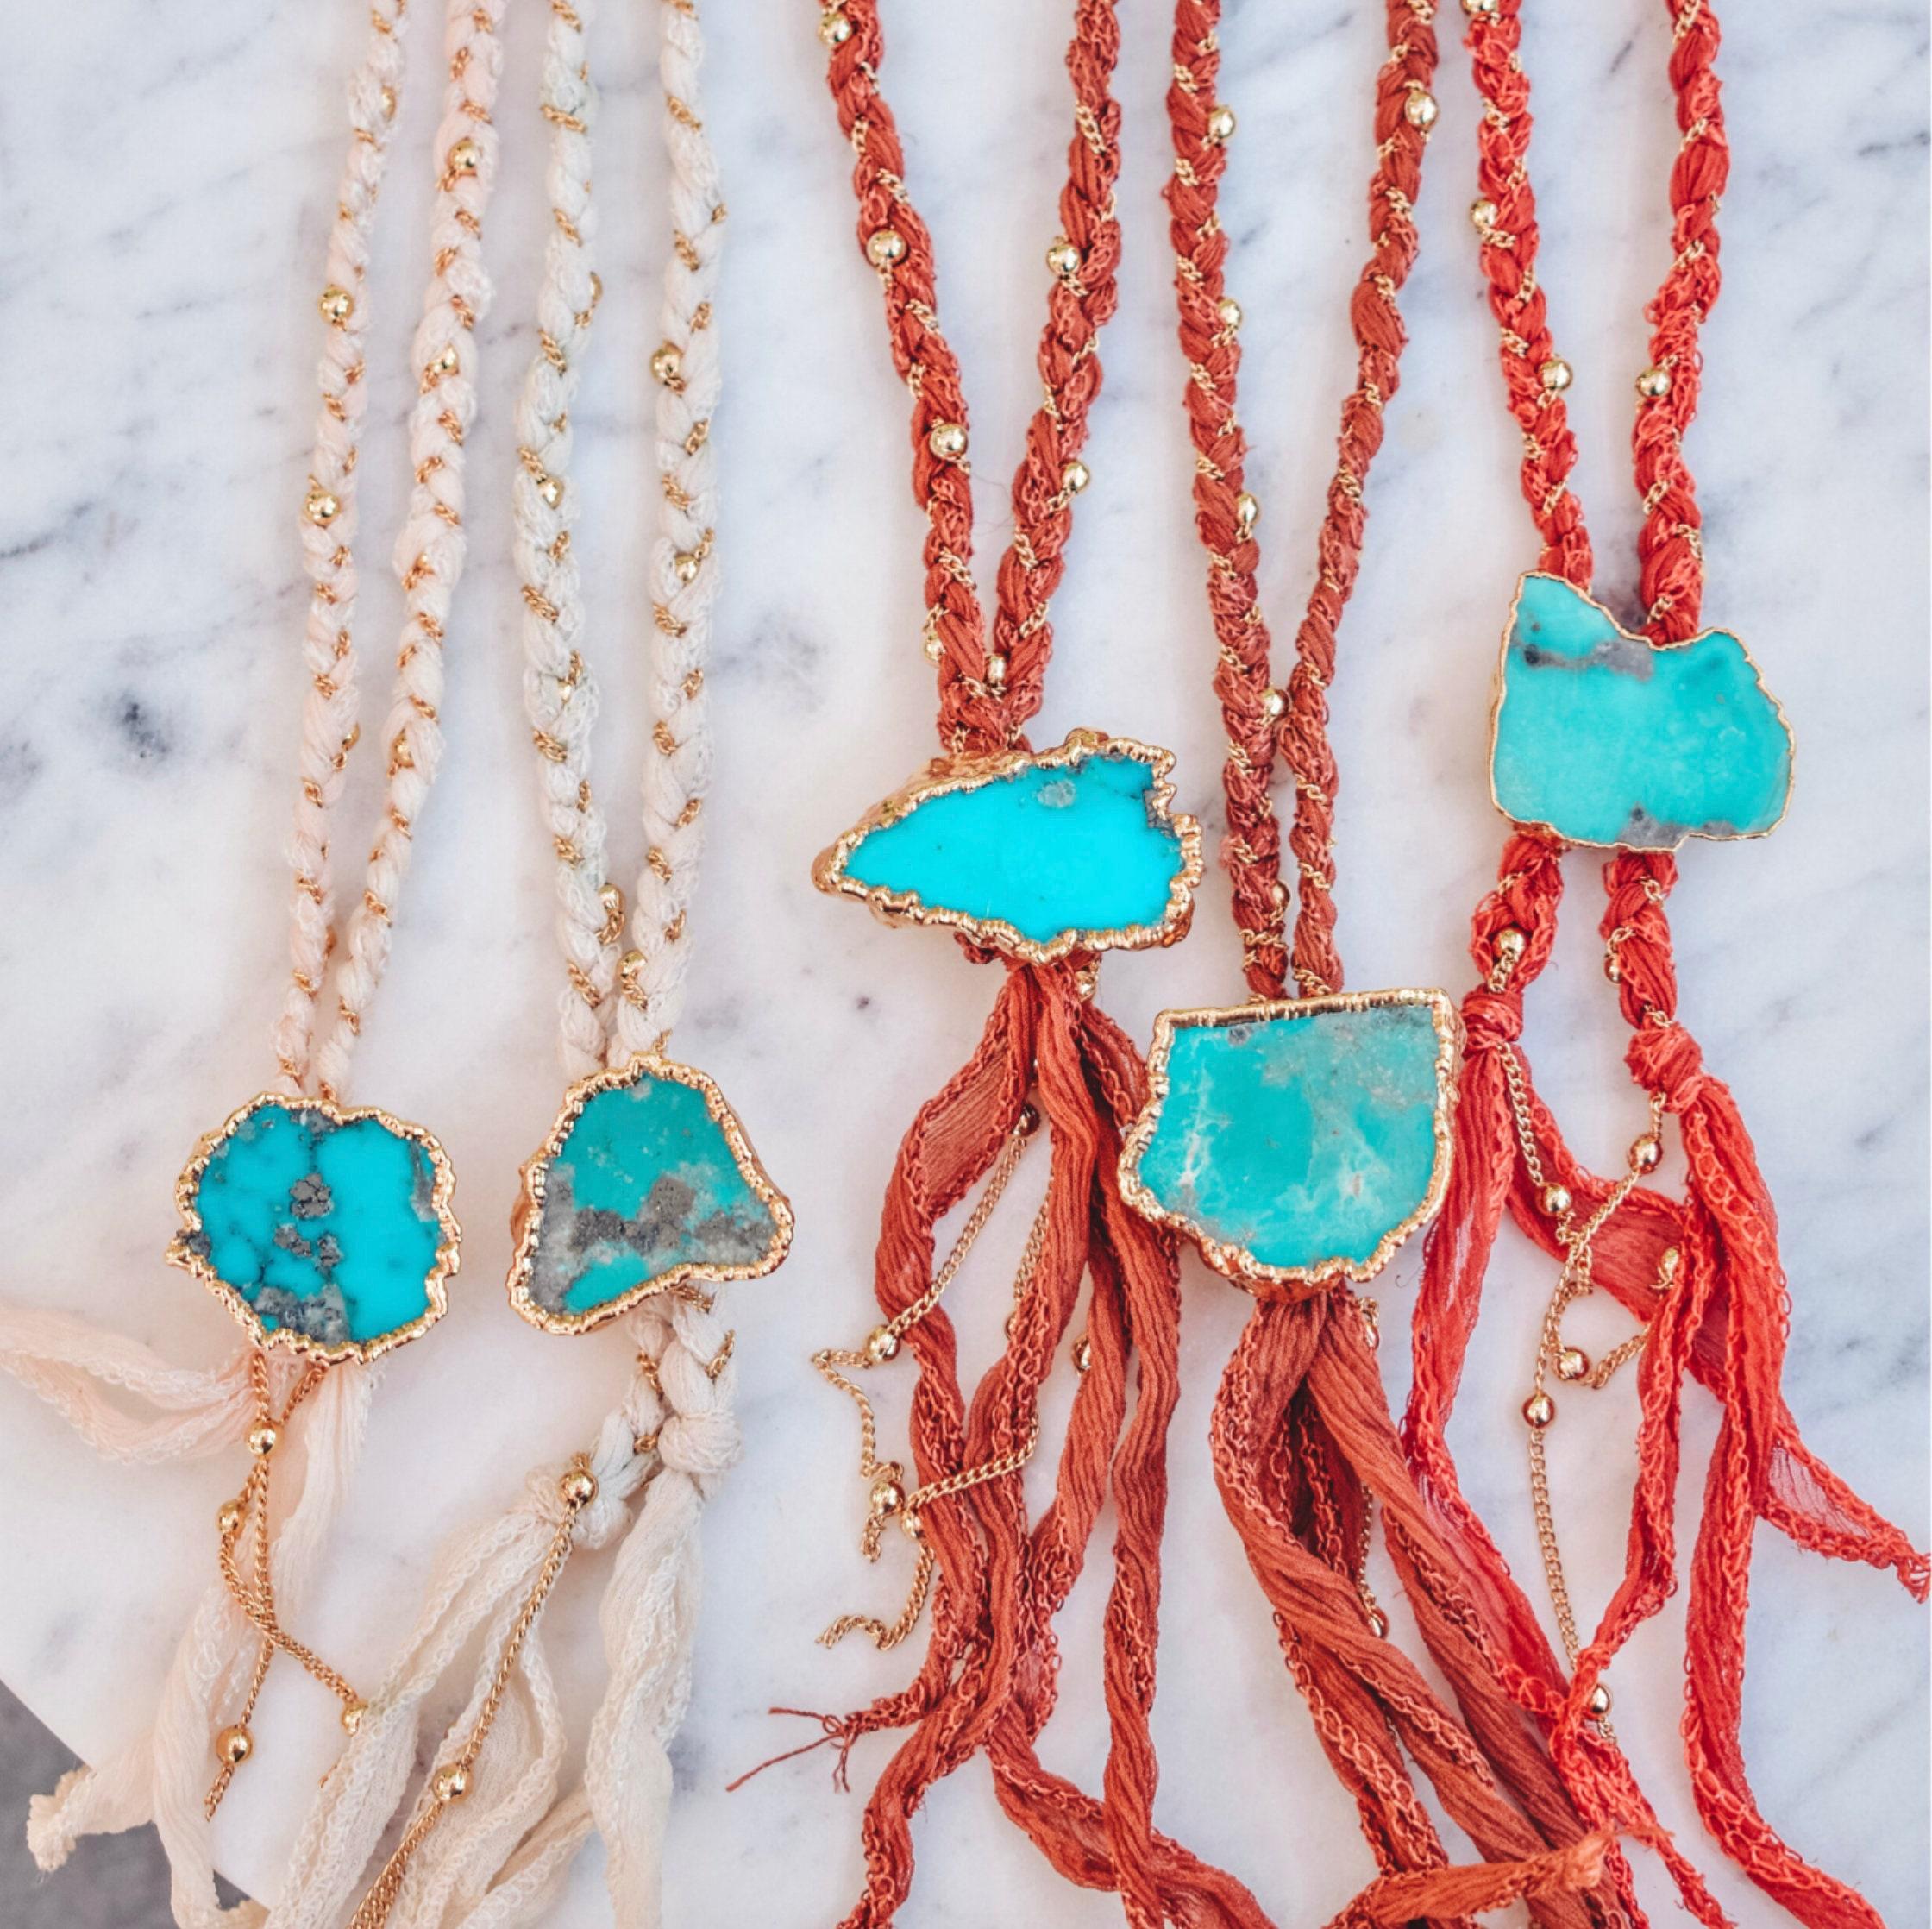 Necklace Gipsy coral brass gold filled 24k